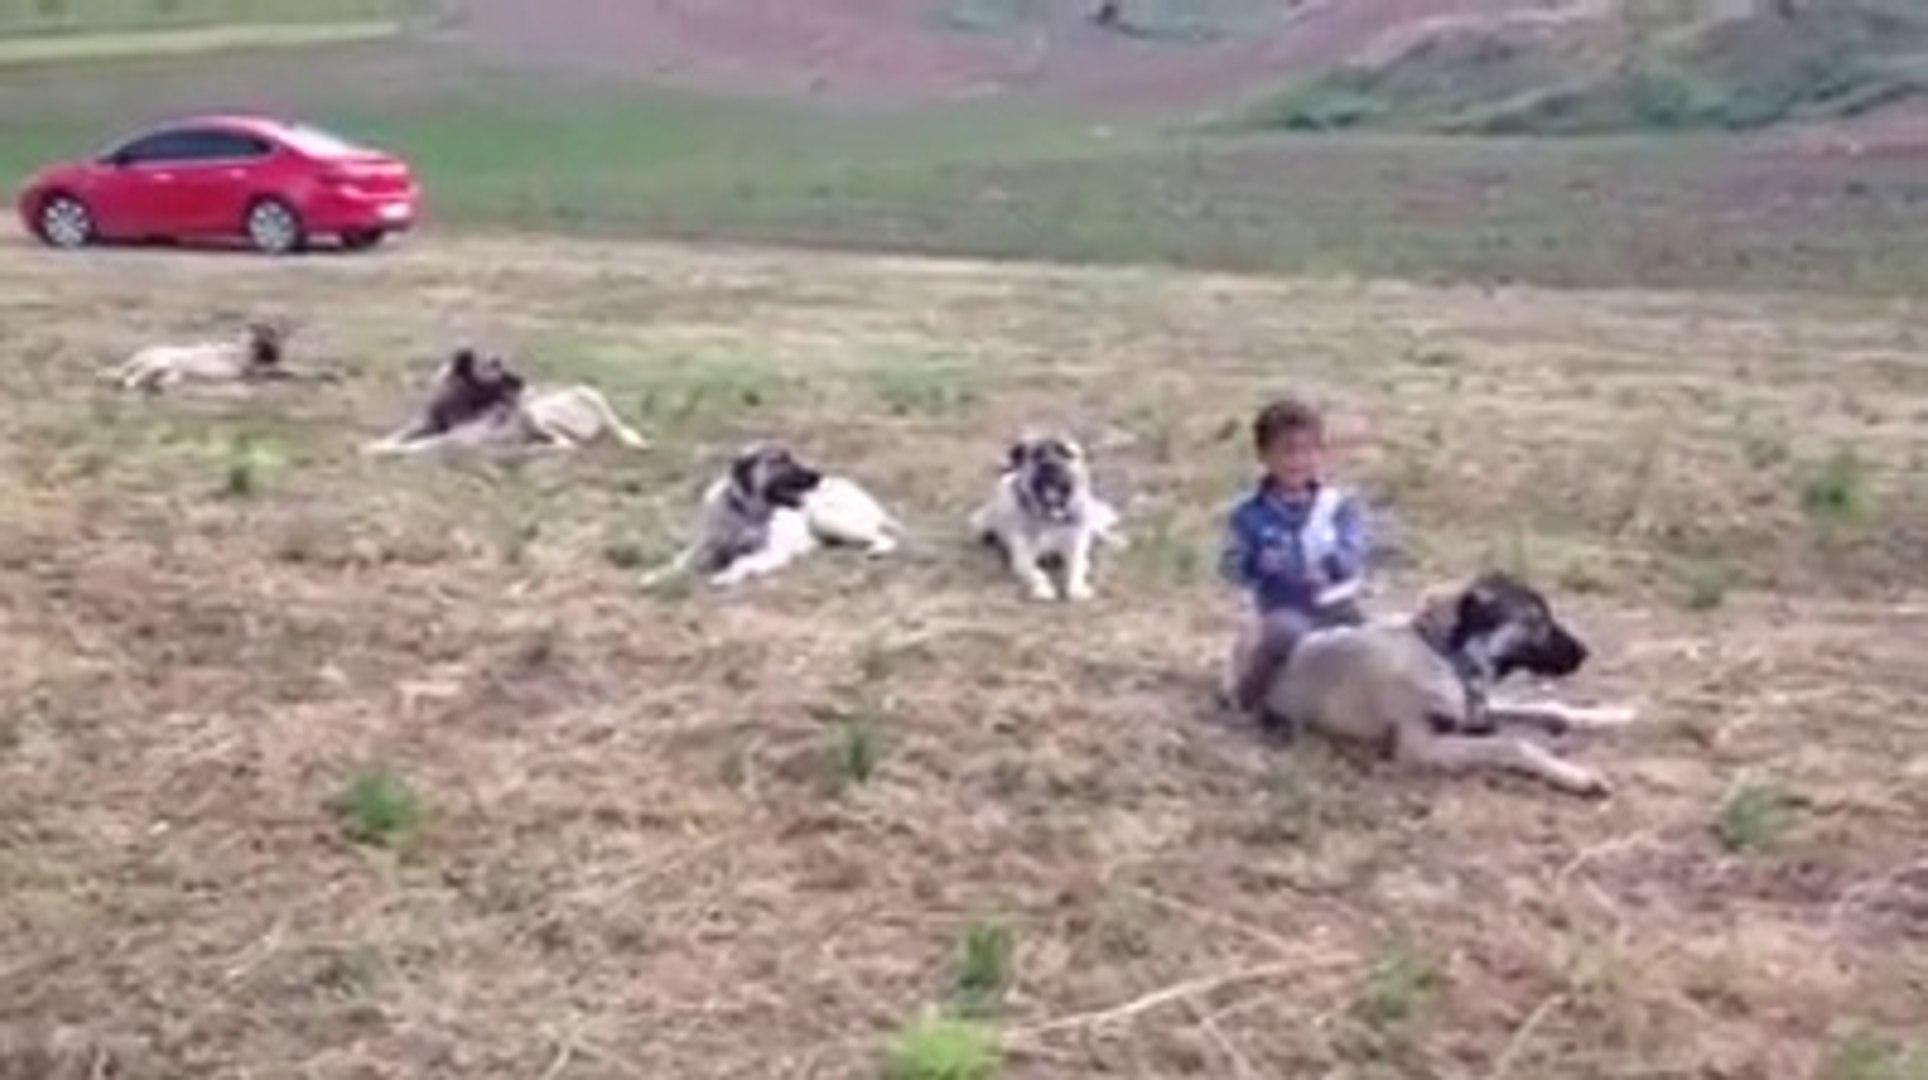 KANGAL KOPEKLERi ARASINDA KUCUK BiR YiGiT - KANGAL DOGS and CHiLD